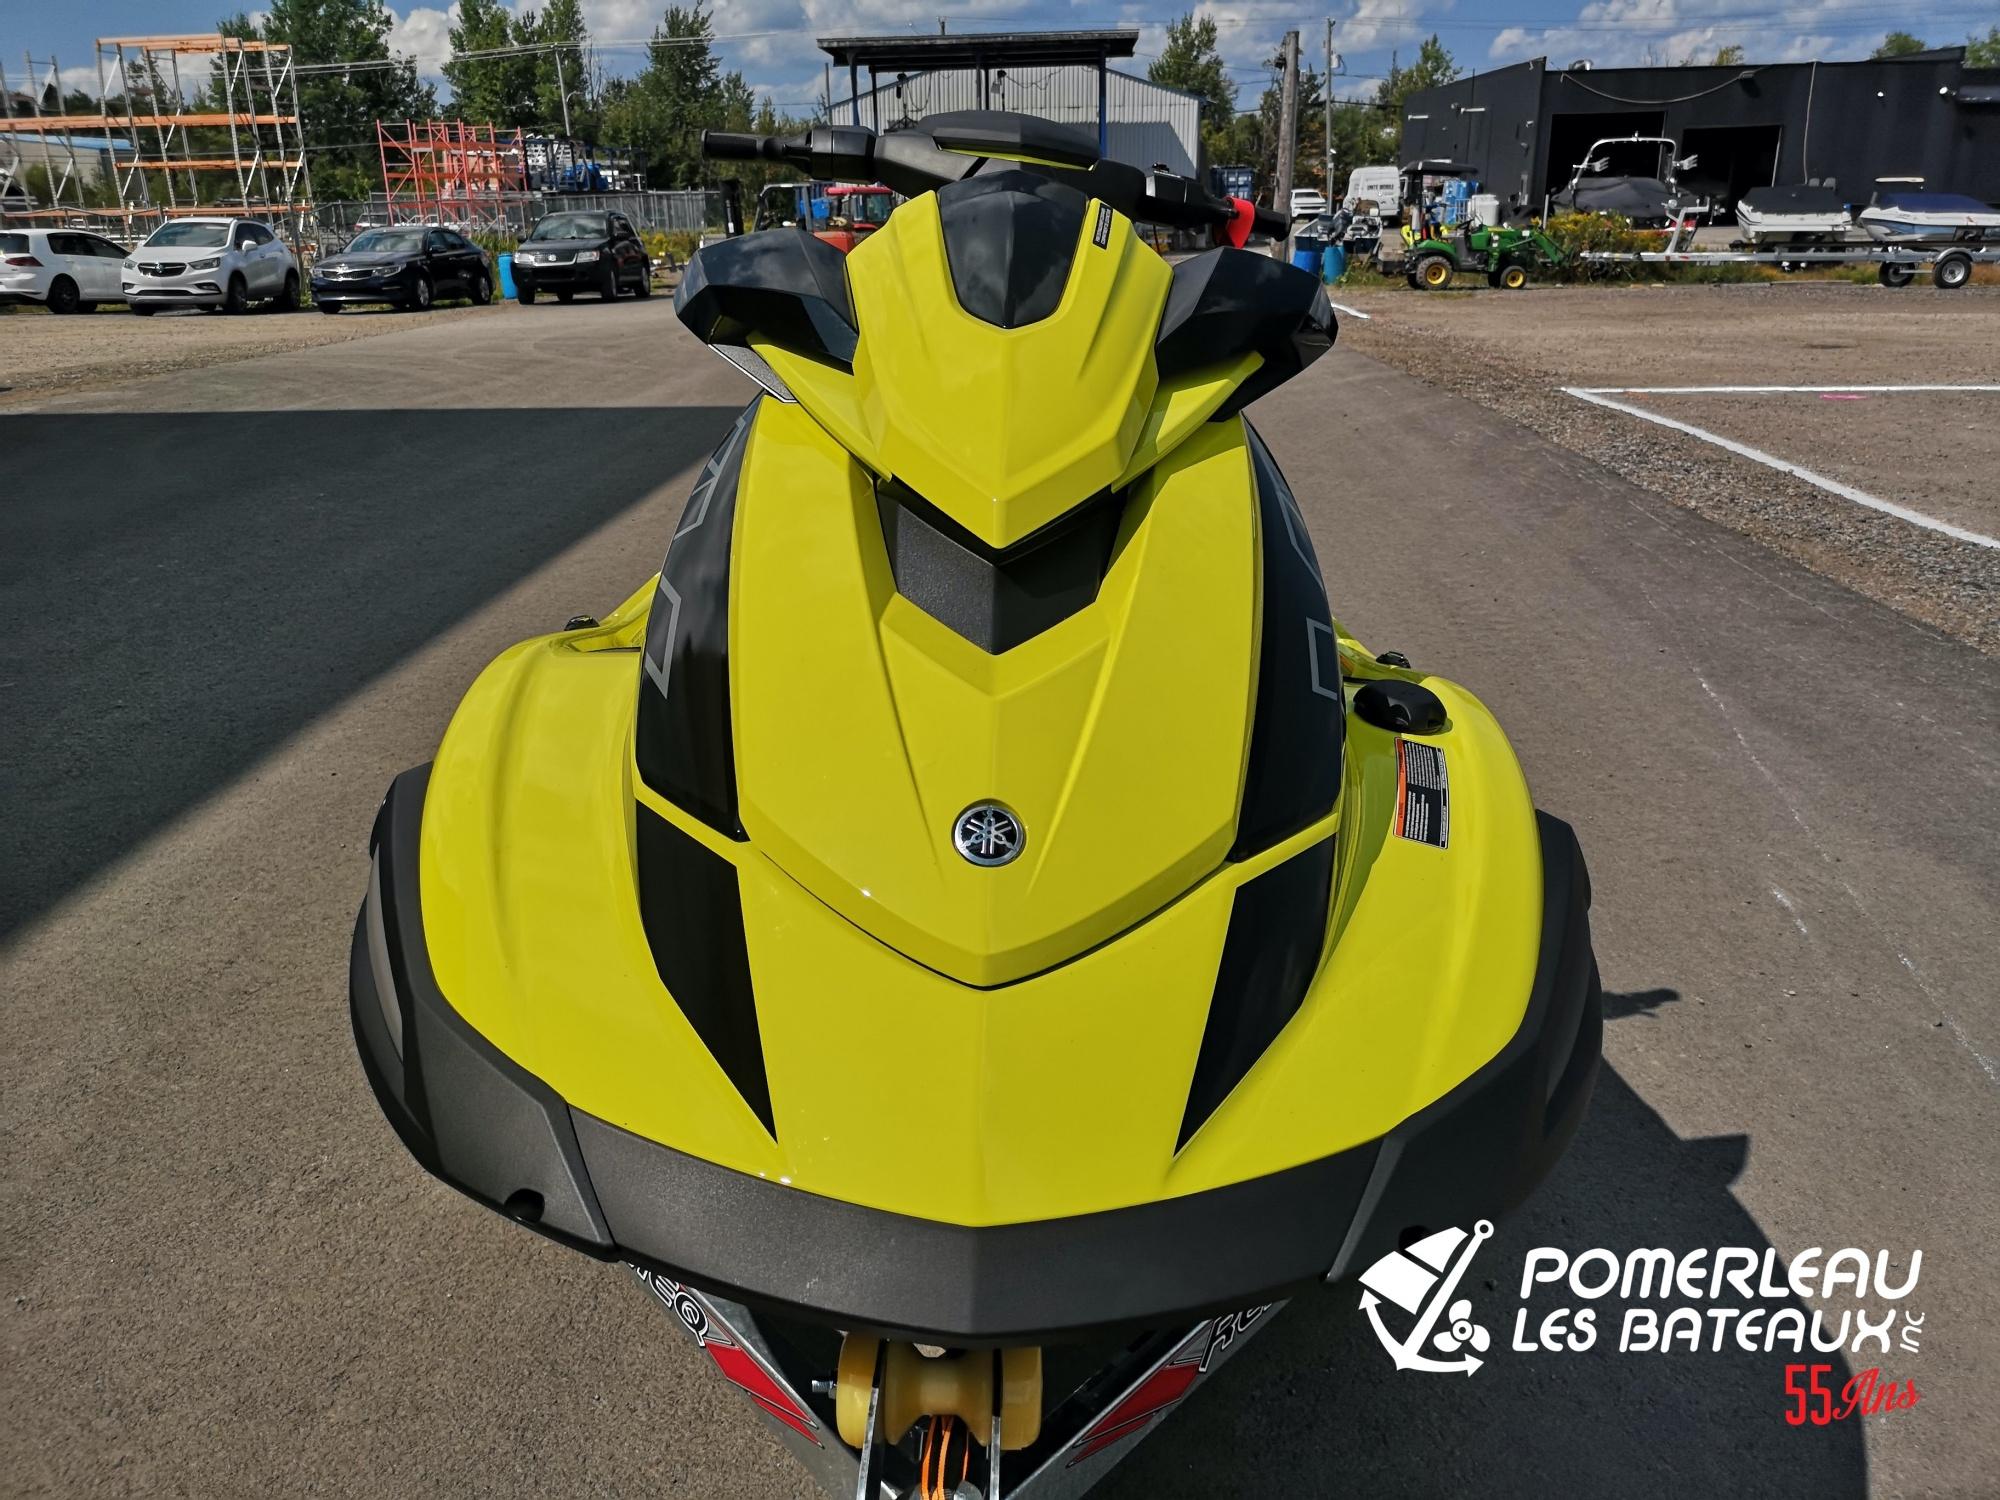 Yamaha vx cruiser ho - IMG_20210824_131621